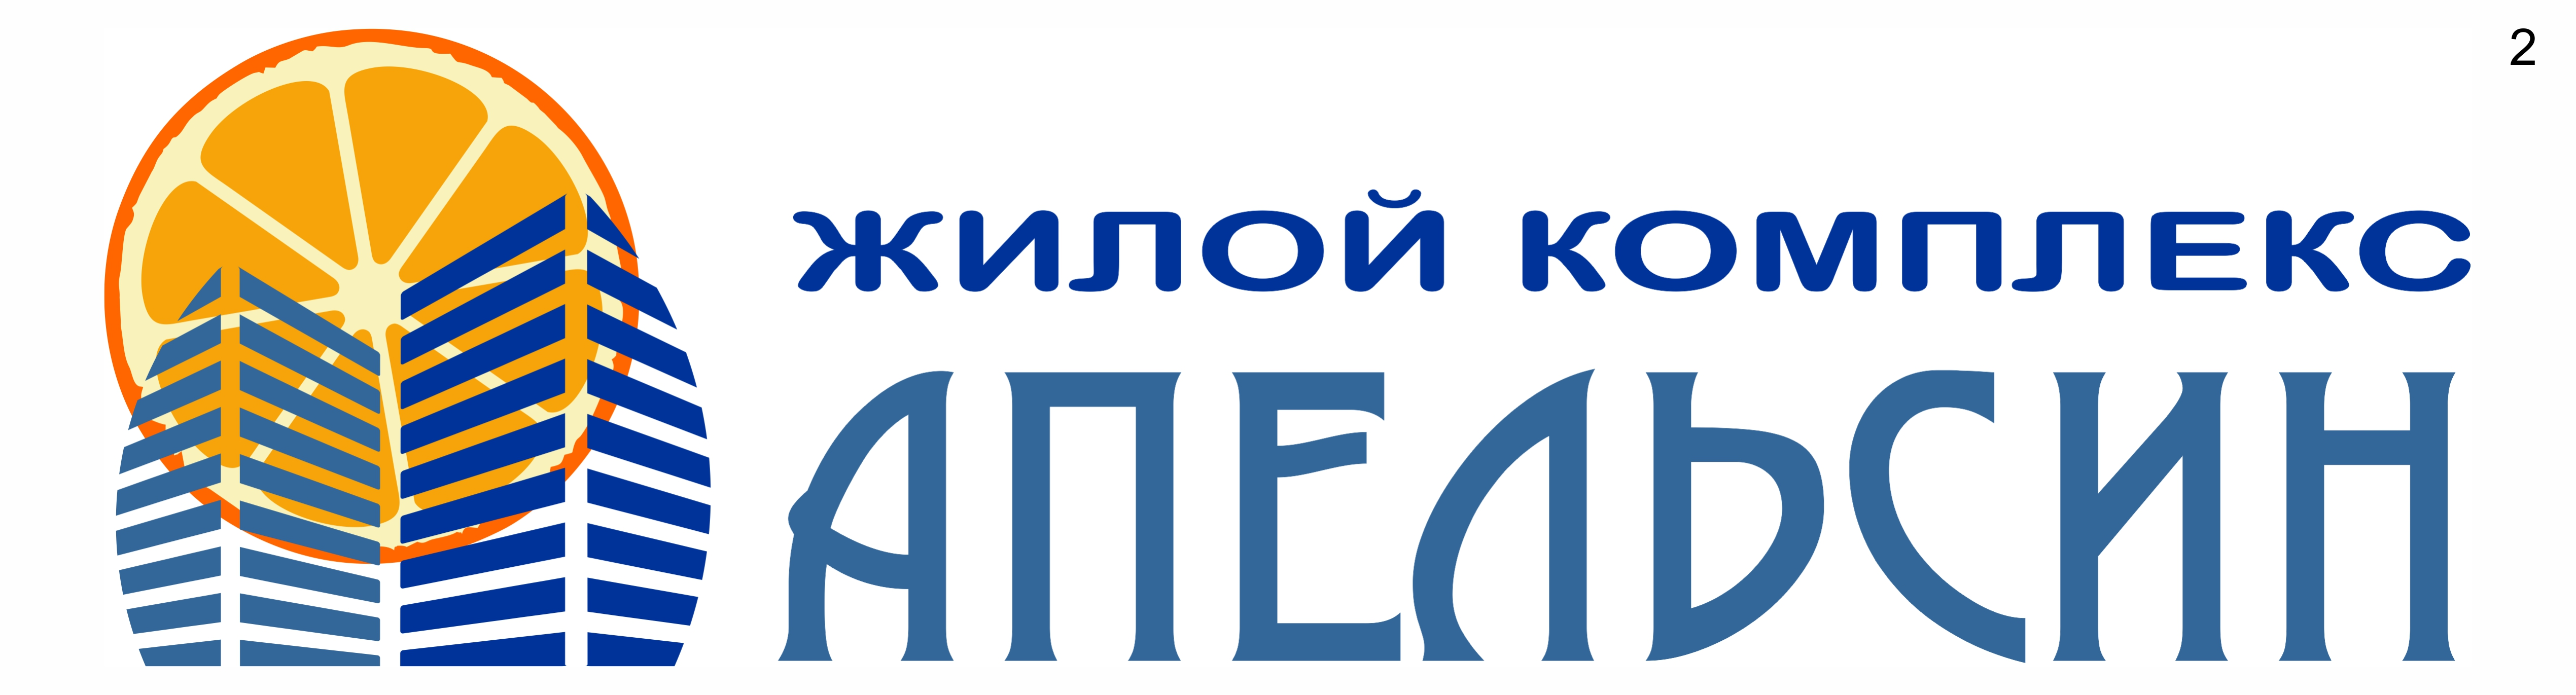 Логотип и фирменный стиль фото f_4825a66fbdaaaf6f.jpg